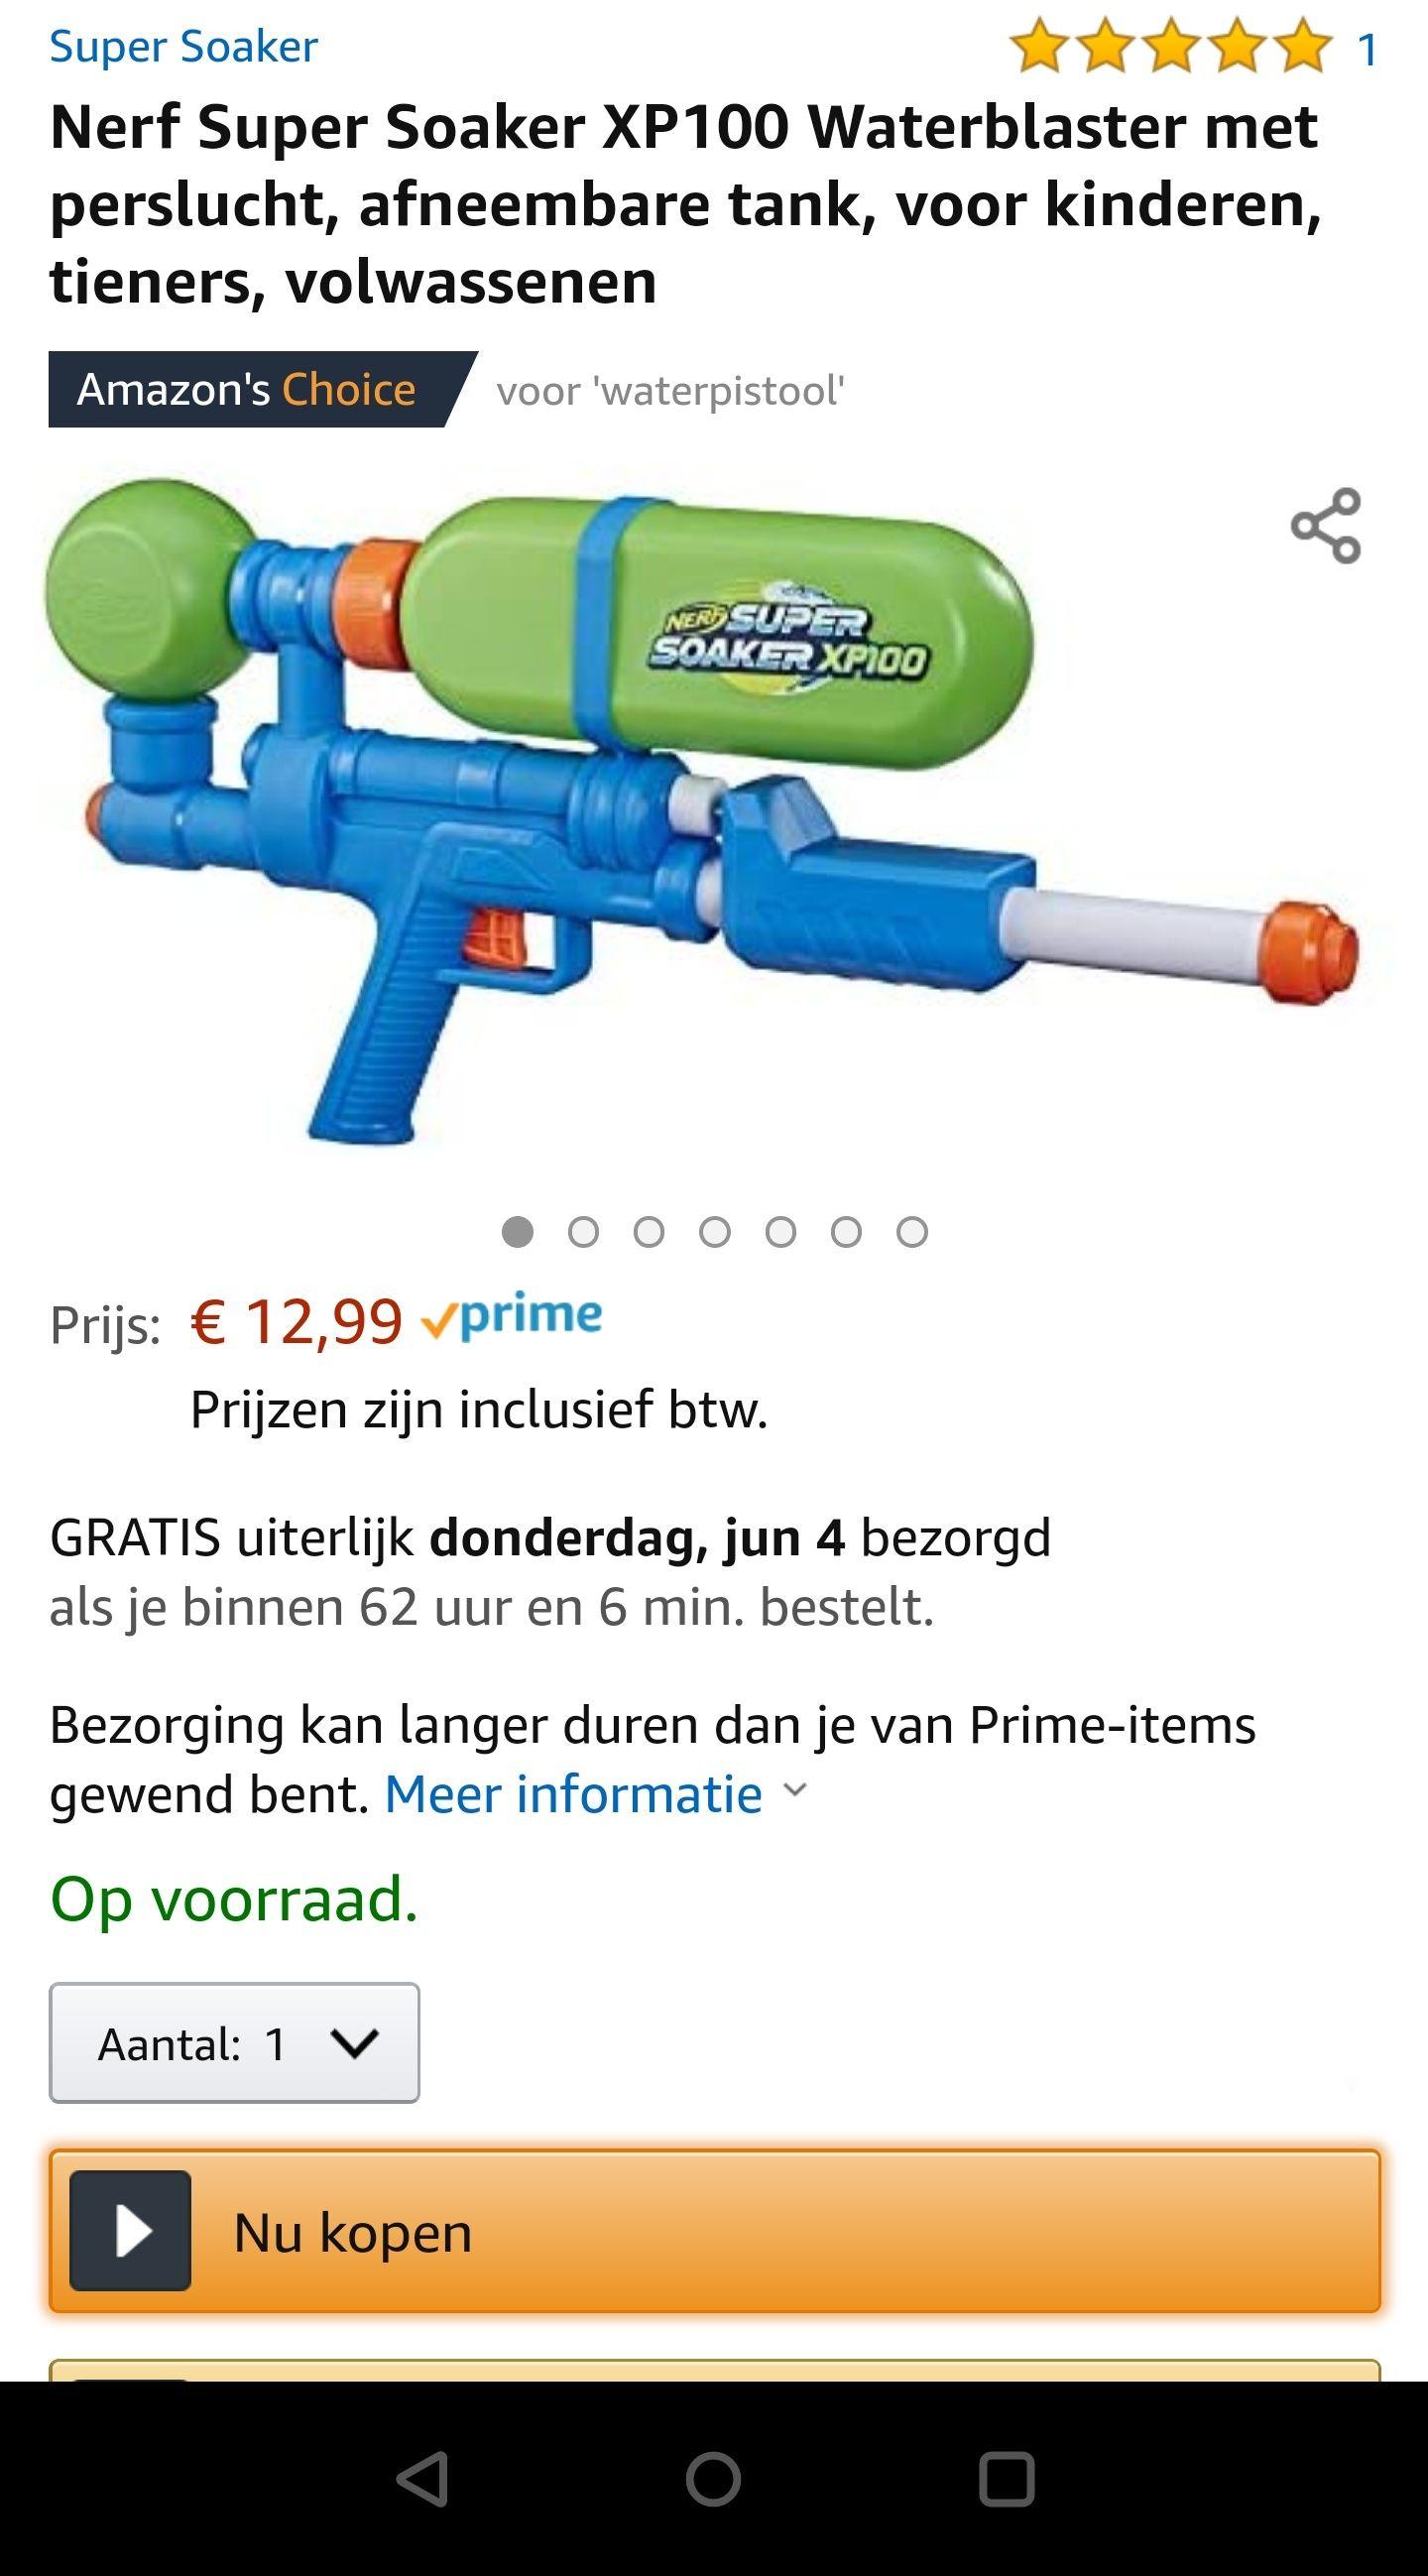 Nerf Super Soaker XP100 bij Amazon.nl